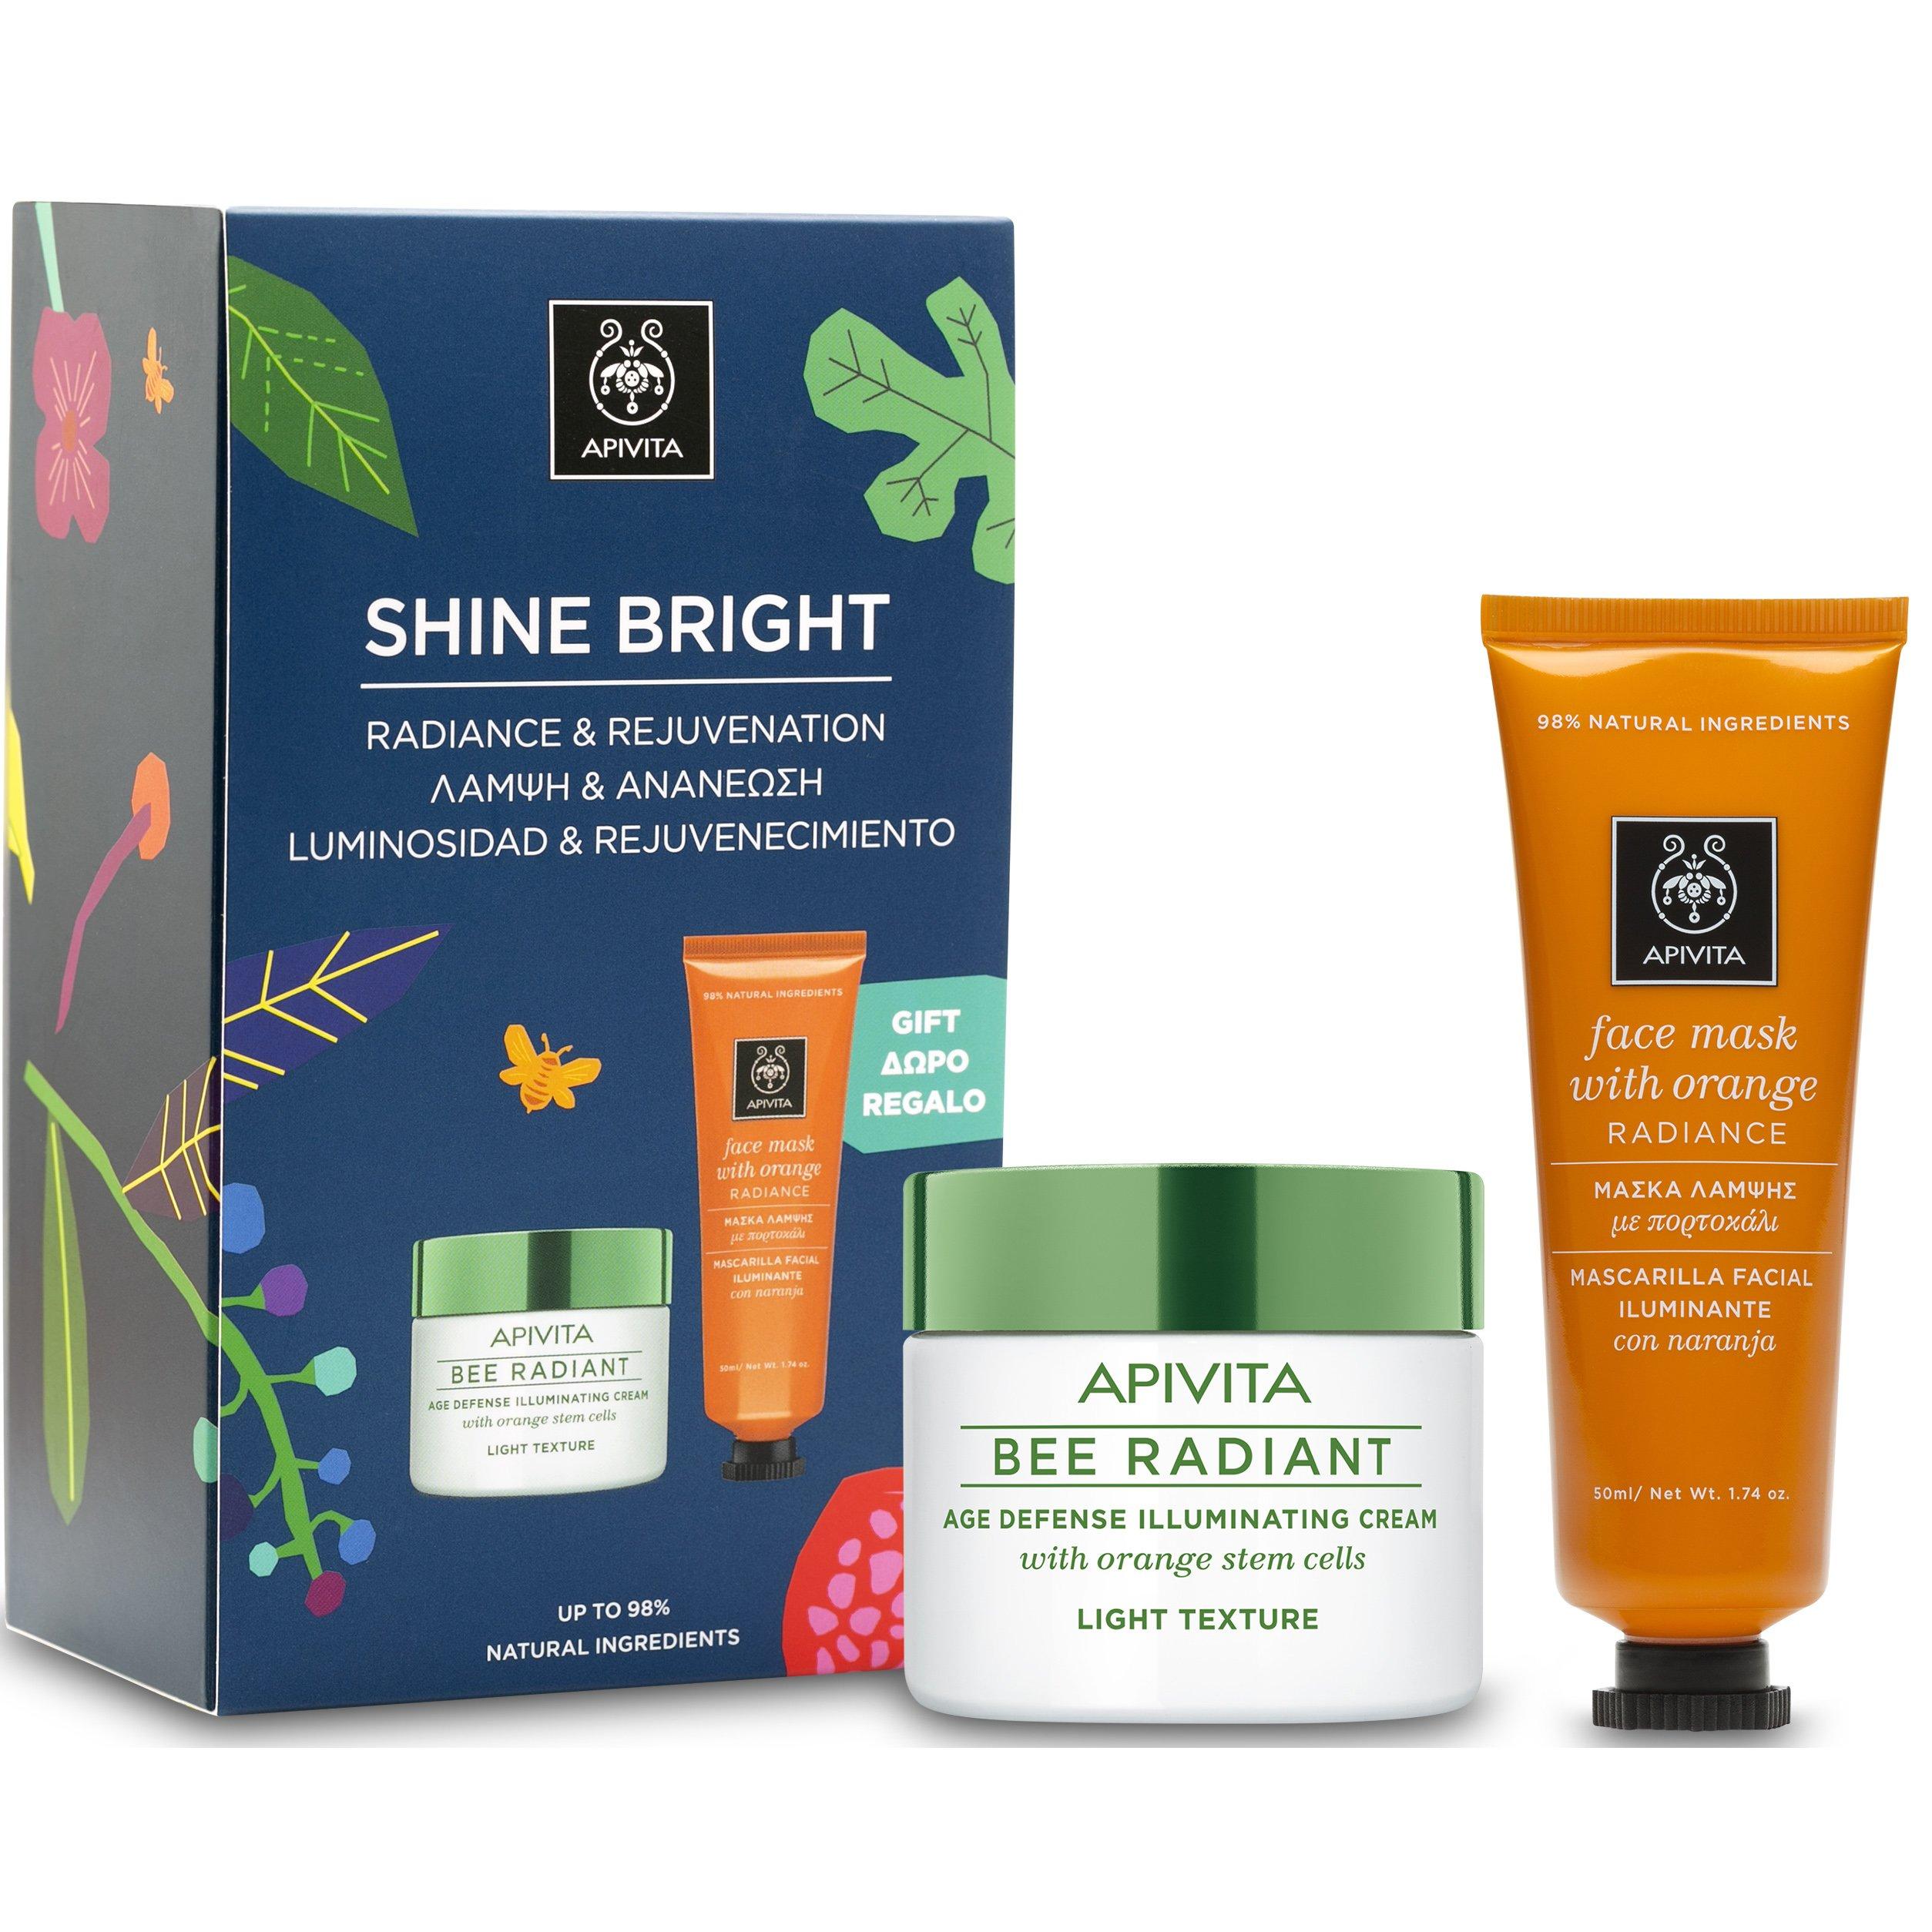 Apivita Box Shine Bright Bee Radiant Cream, Light Texture Κρέμα Αντιγήρανσης & Λ προσφορές   σετ περιποίησης προσώπου   σετ καθαρισμού προσώπου   απολέπισης   μά